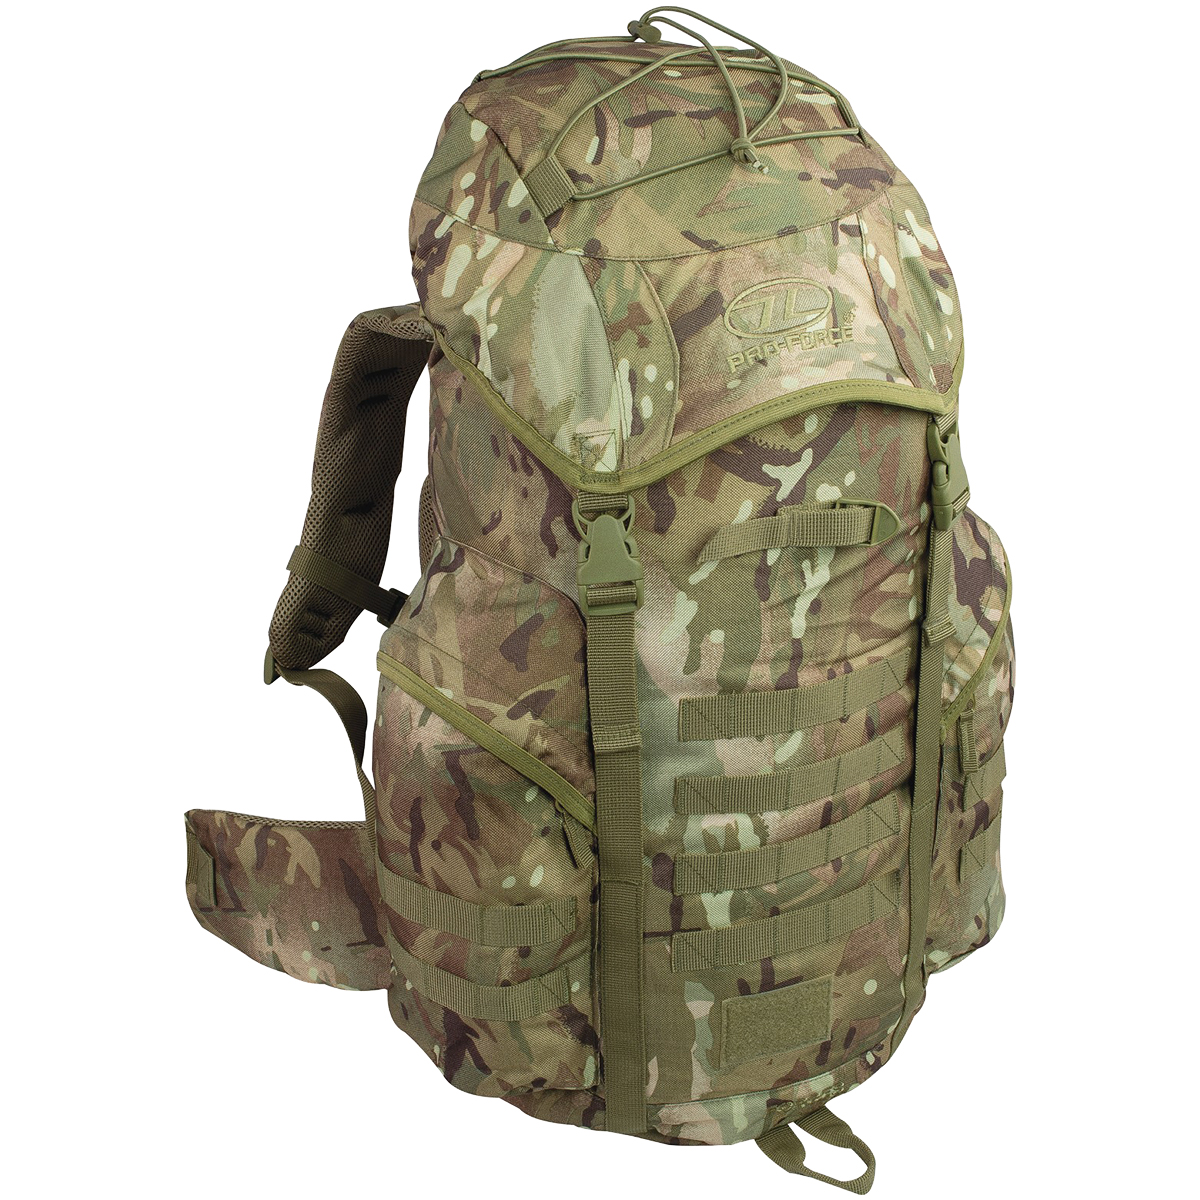 HIGHLANDER PRO-FORCE RECON 40 l Sac à dos HMTC Camo Camouflage Daysack